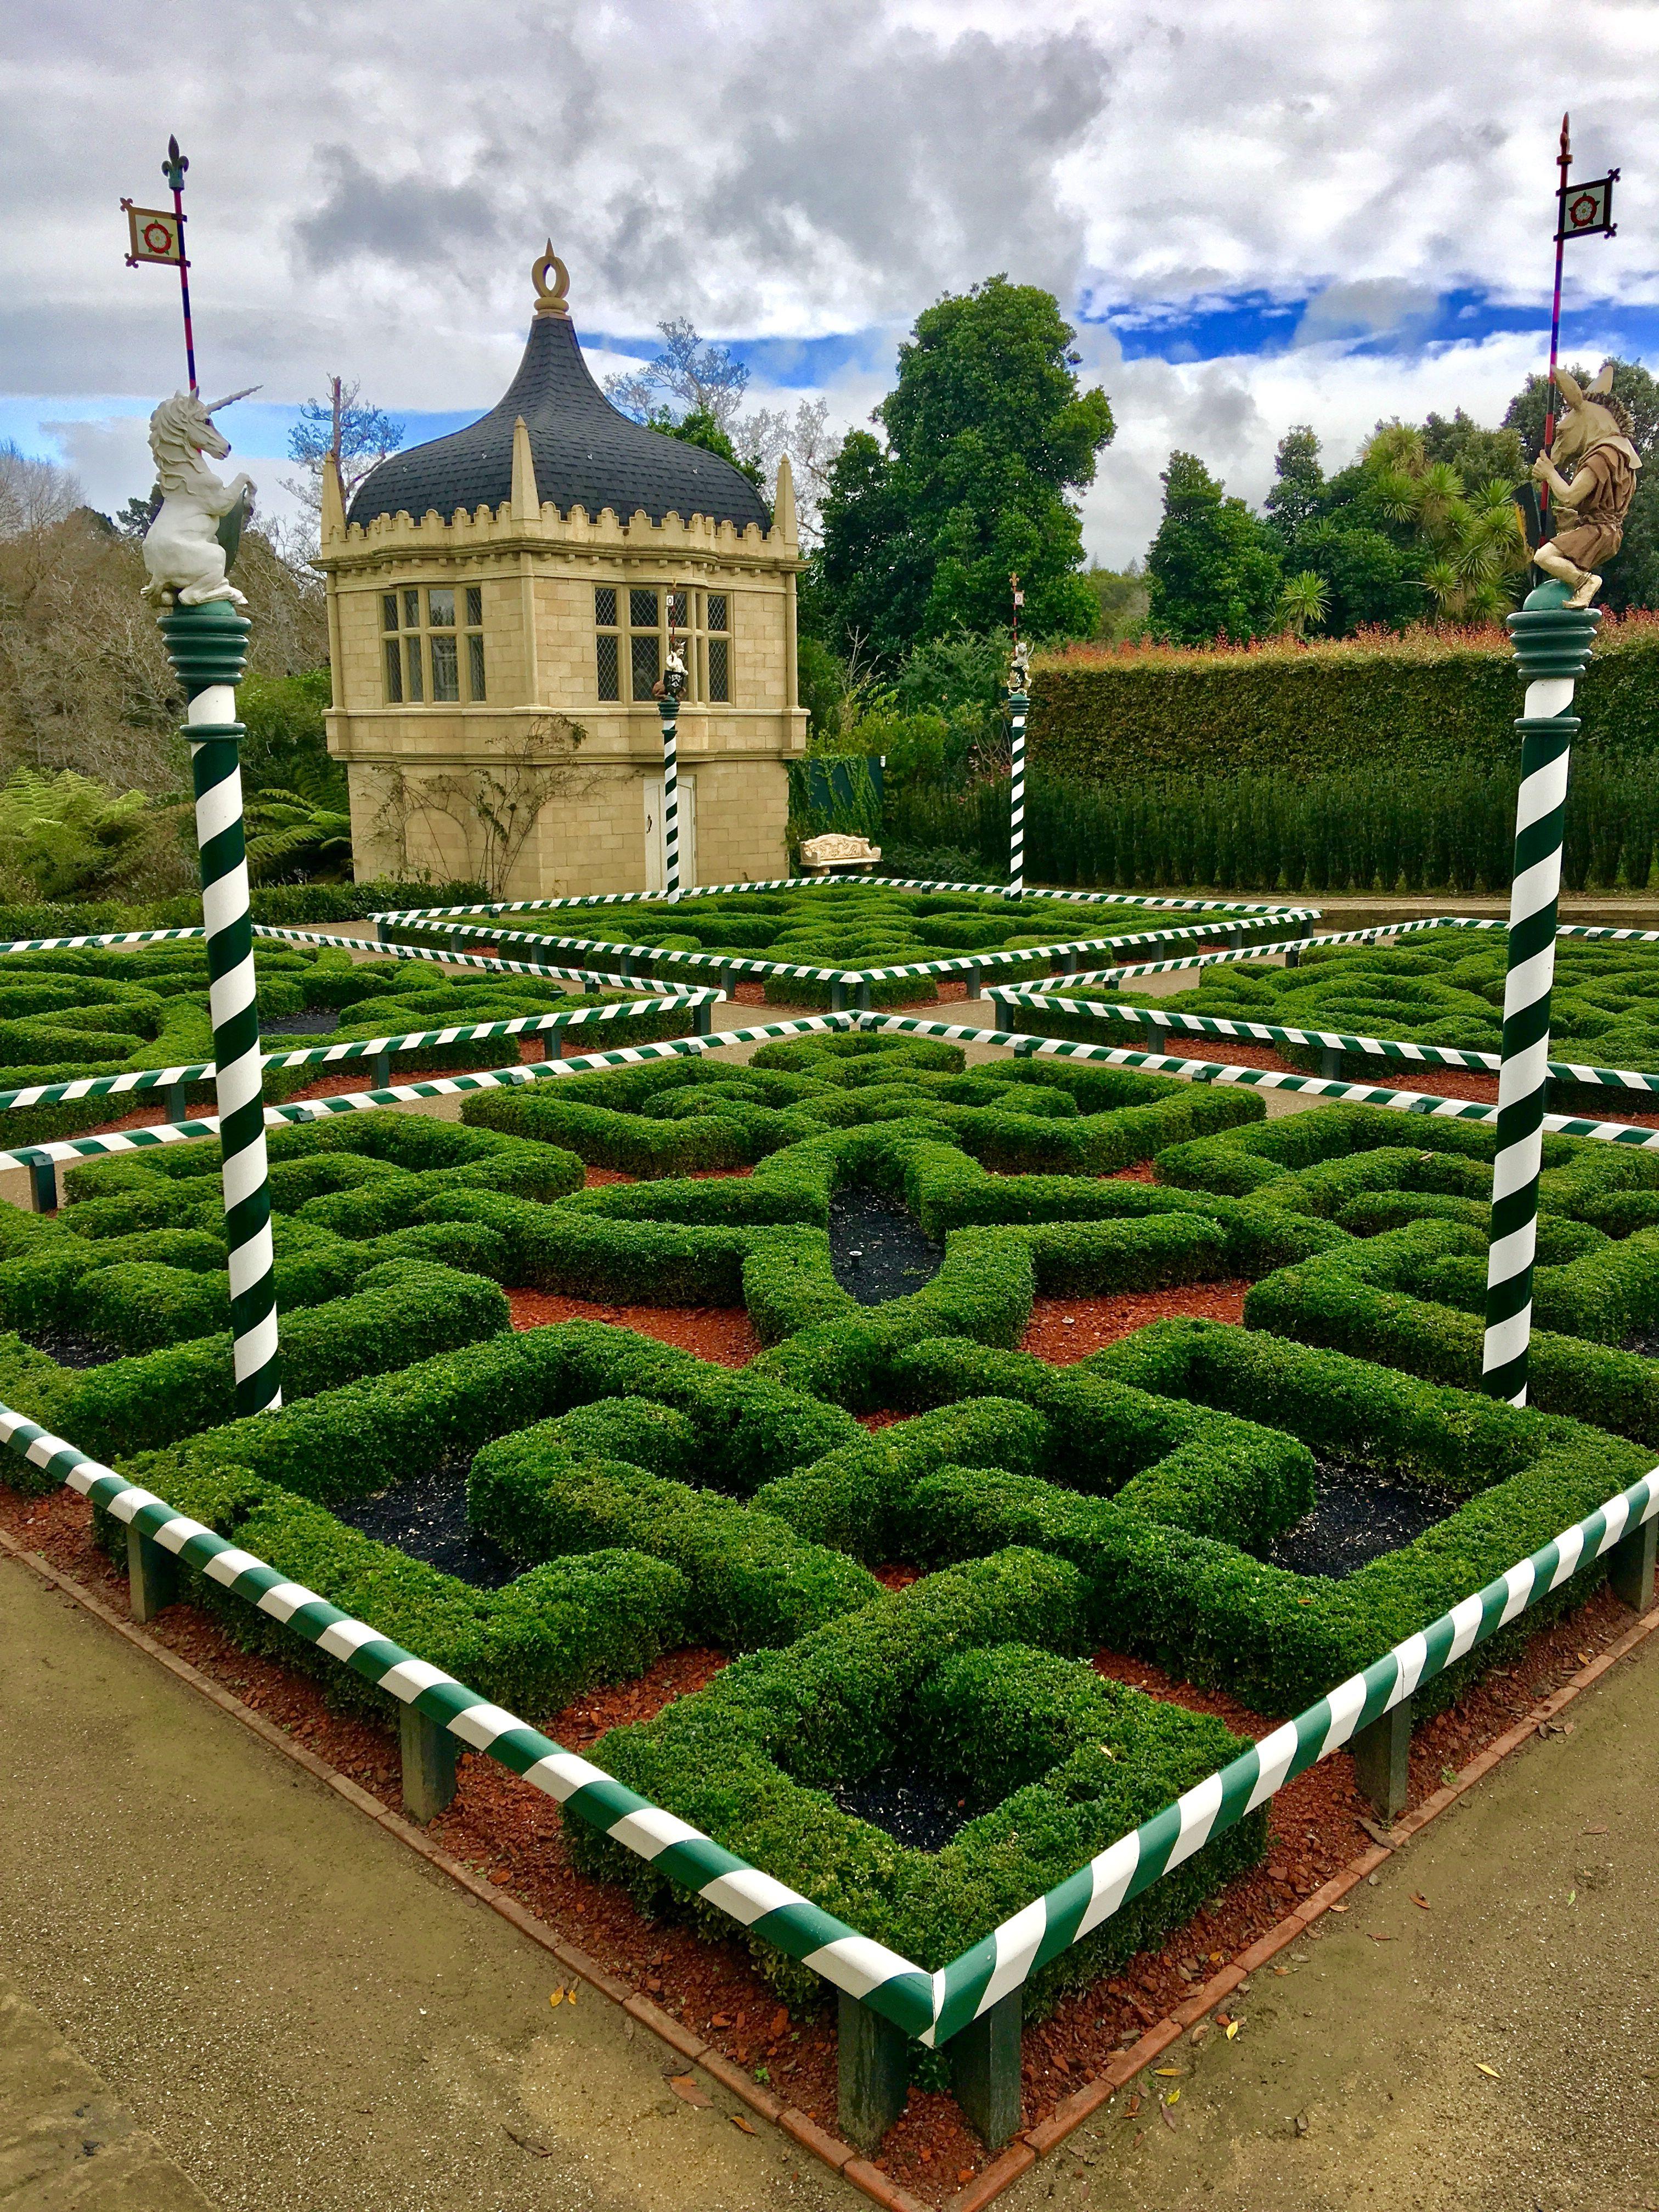 64c608cd8f3508746905c66689656580 - Hamilton Gardens New Zealand Alice In Wonderland